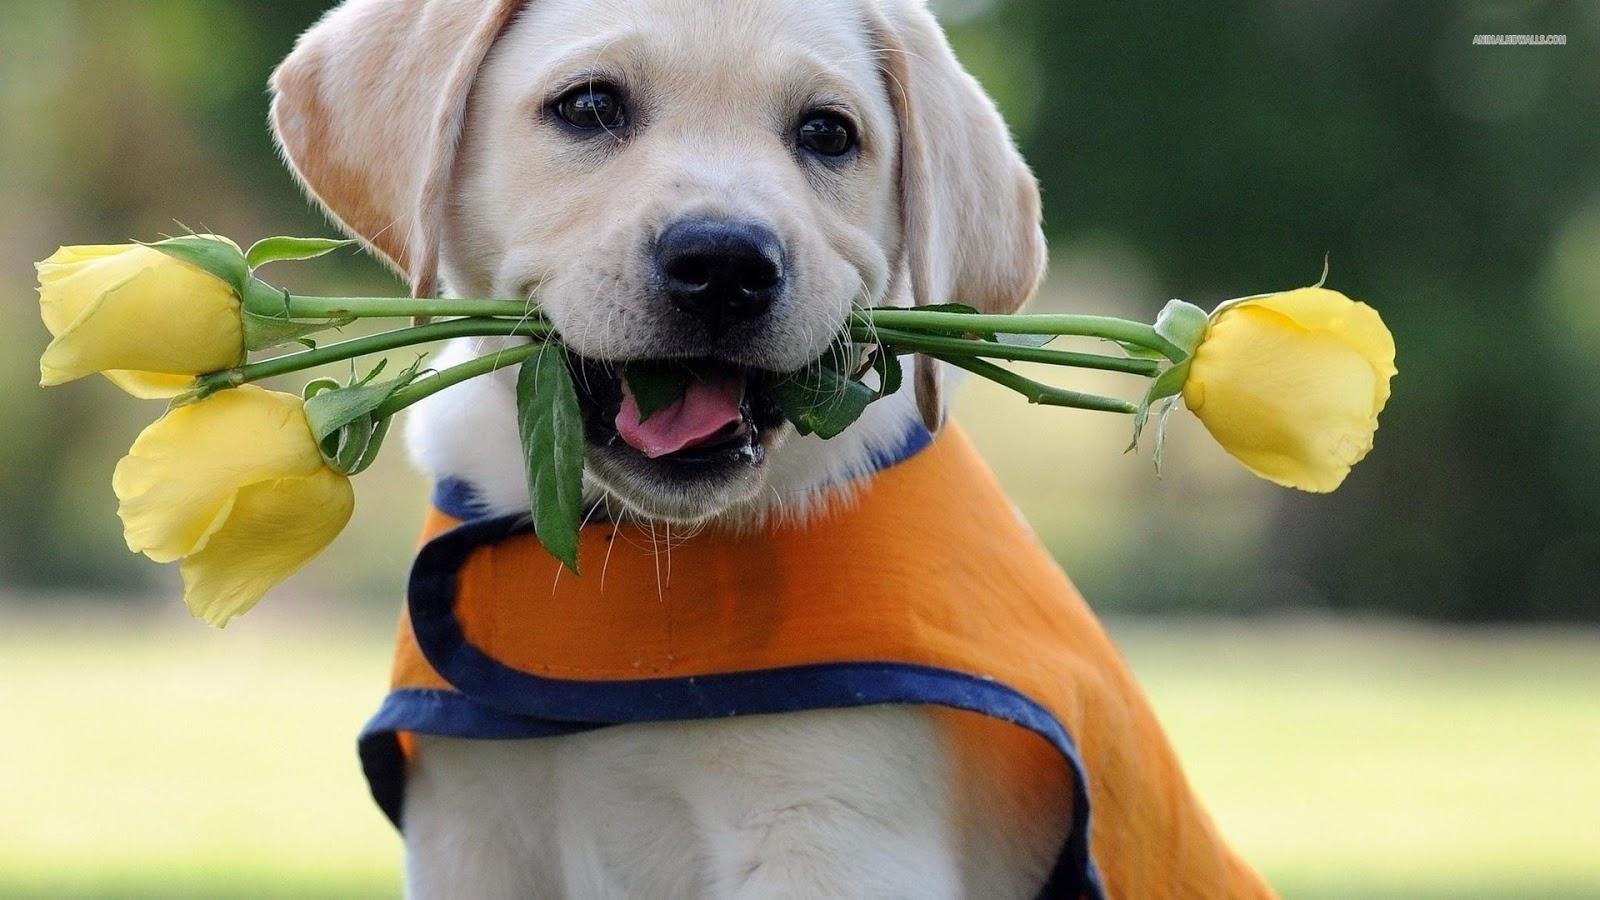 Cute Puppy Dogs: labrador retriever puppies